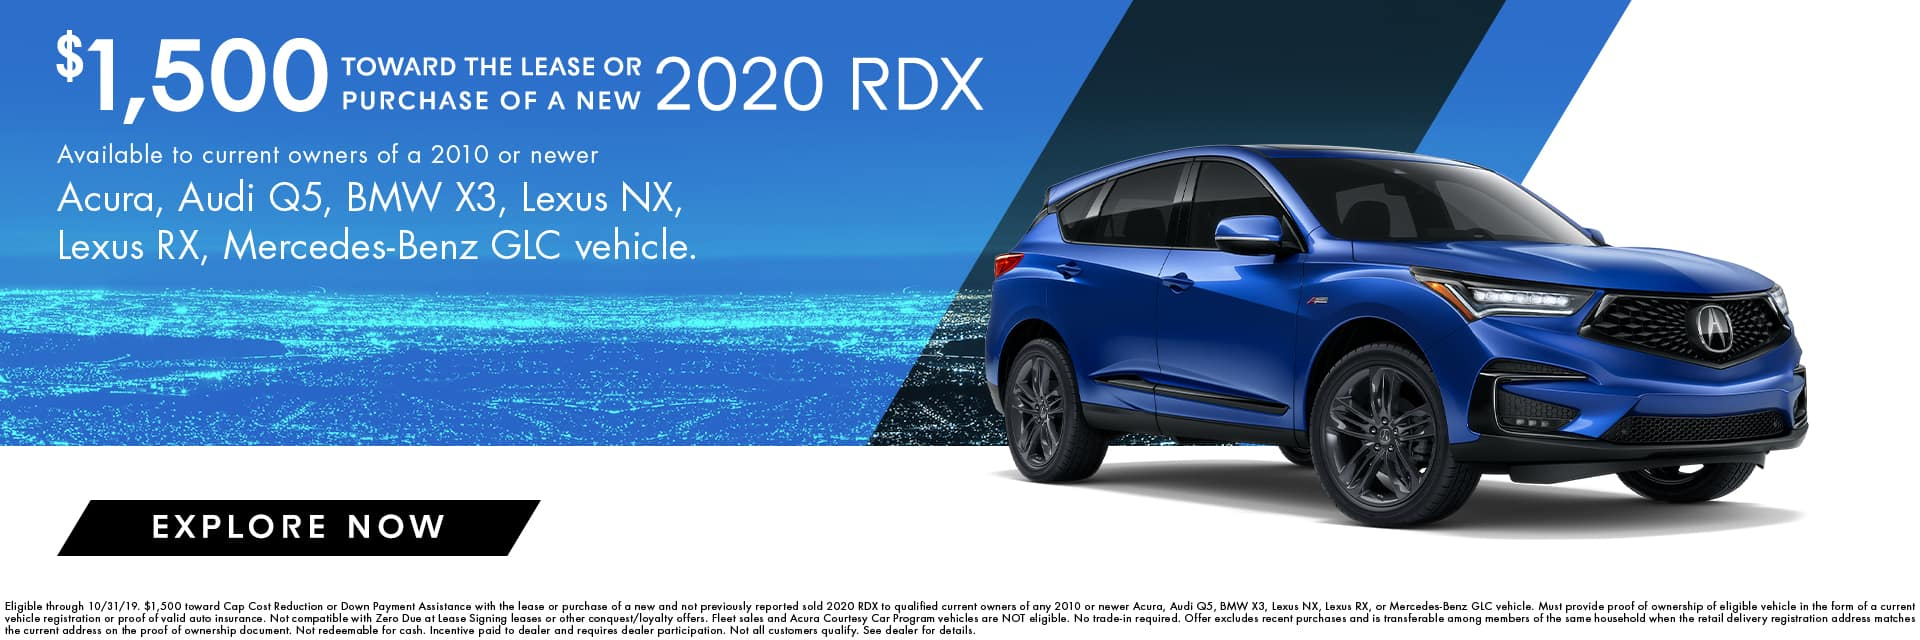 2020 RDX Banner